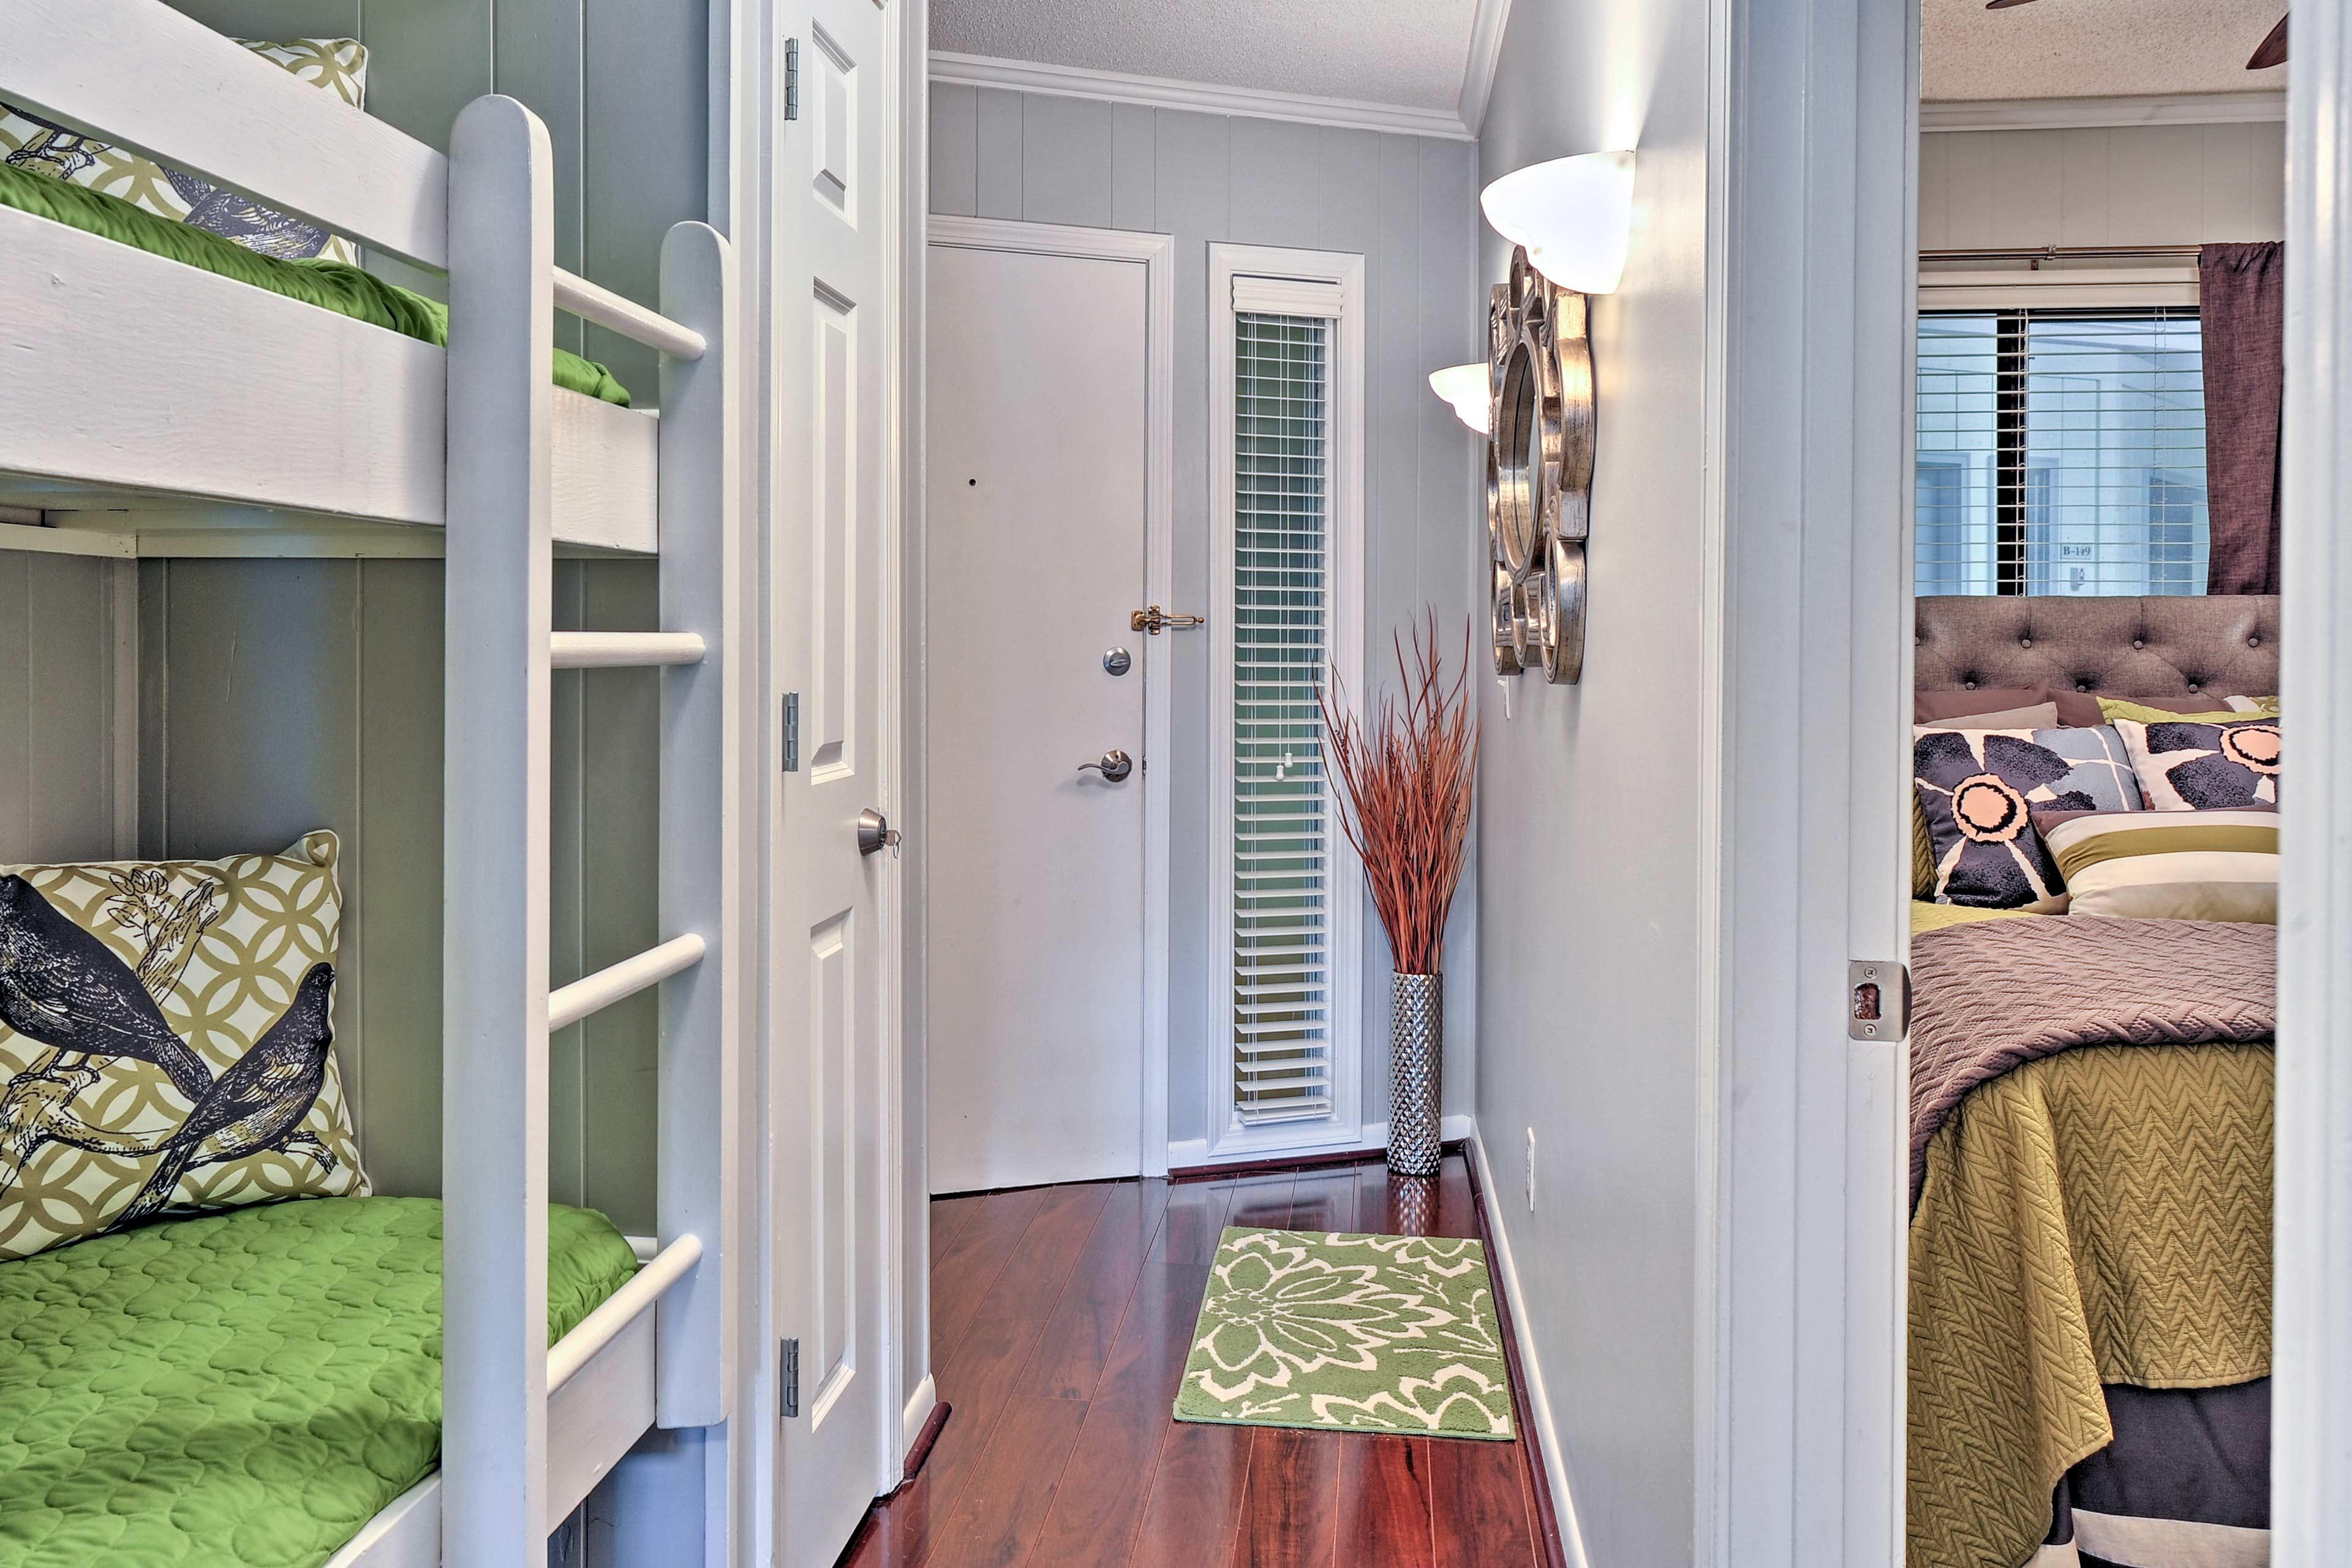 Hallway | Central A/C